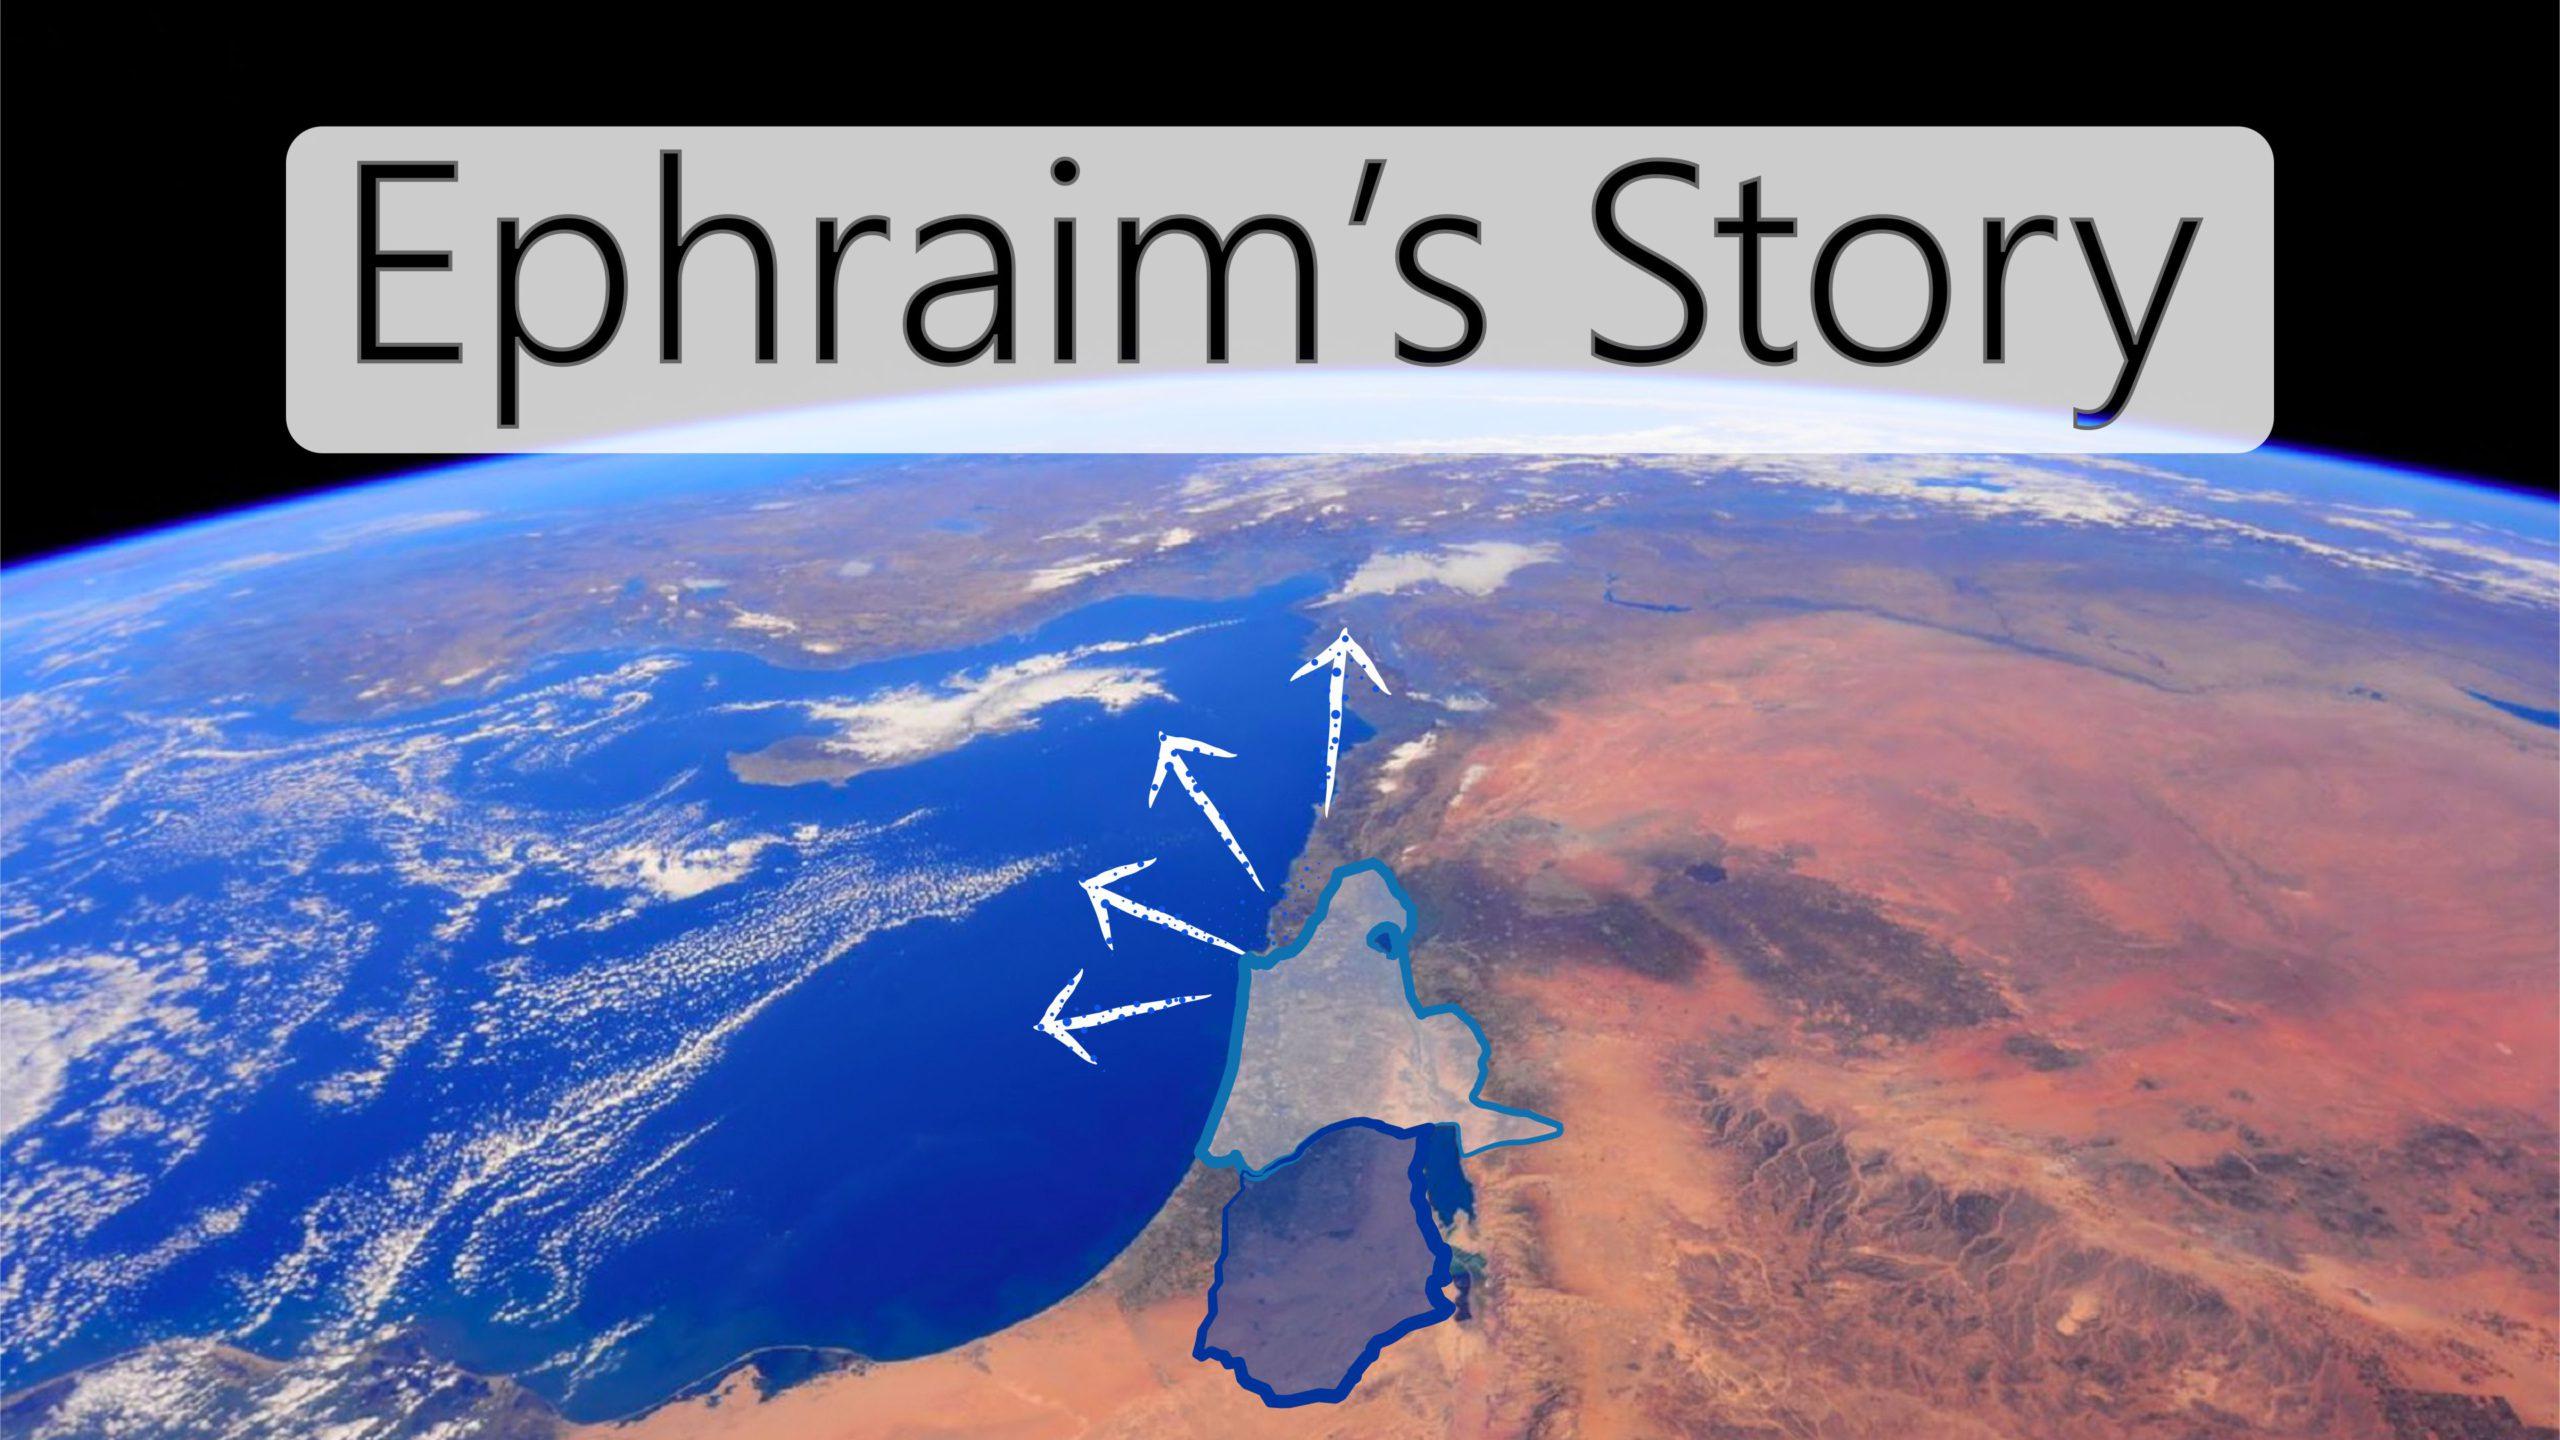 Ephraim's Story (In progress)